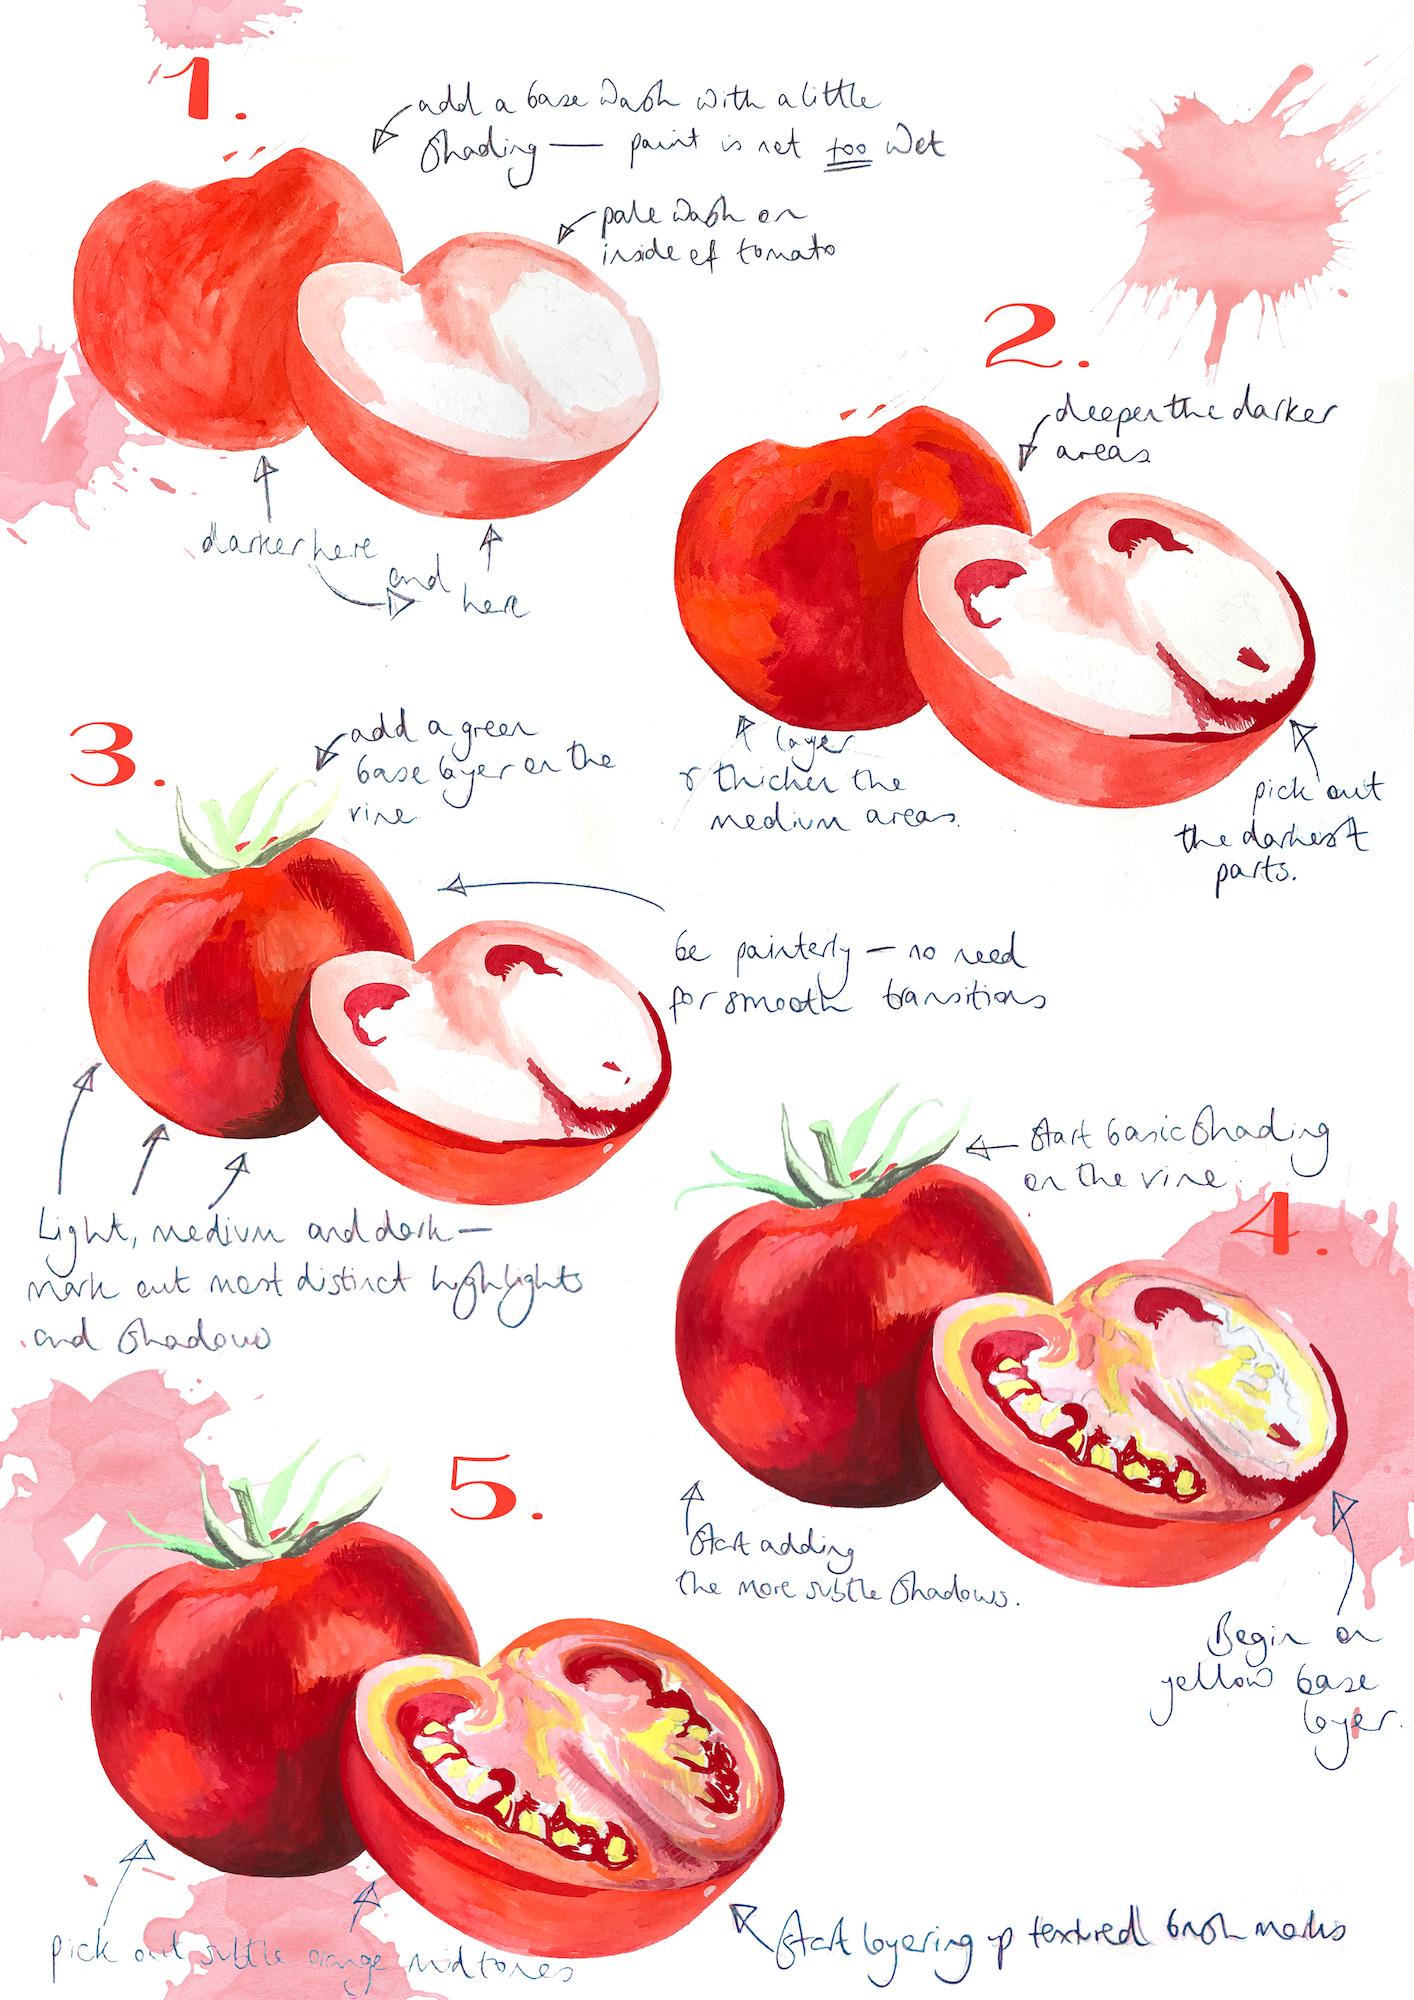 Tomatoes 1.jpg